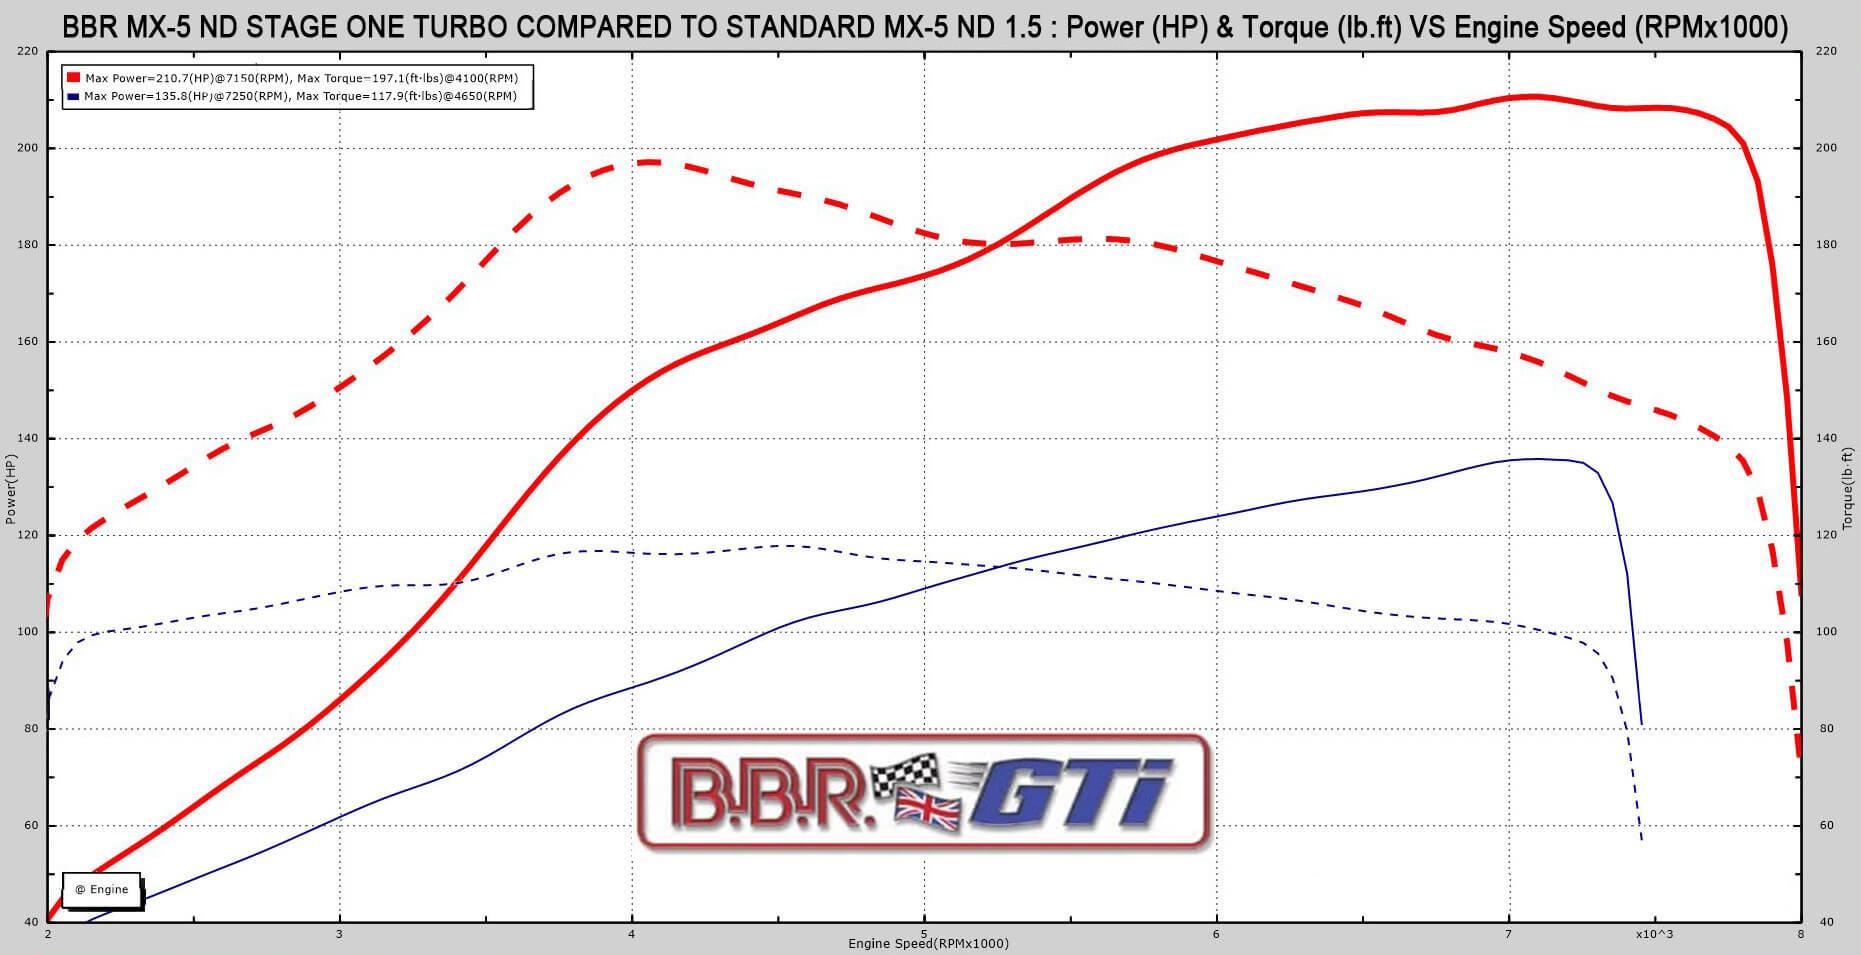 Gráfica de potencia del Mazda MX-5 1.5 BBR Turbo